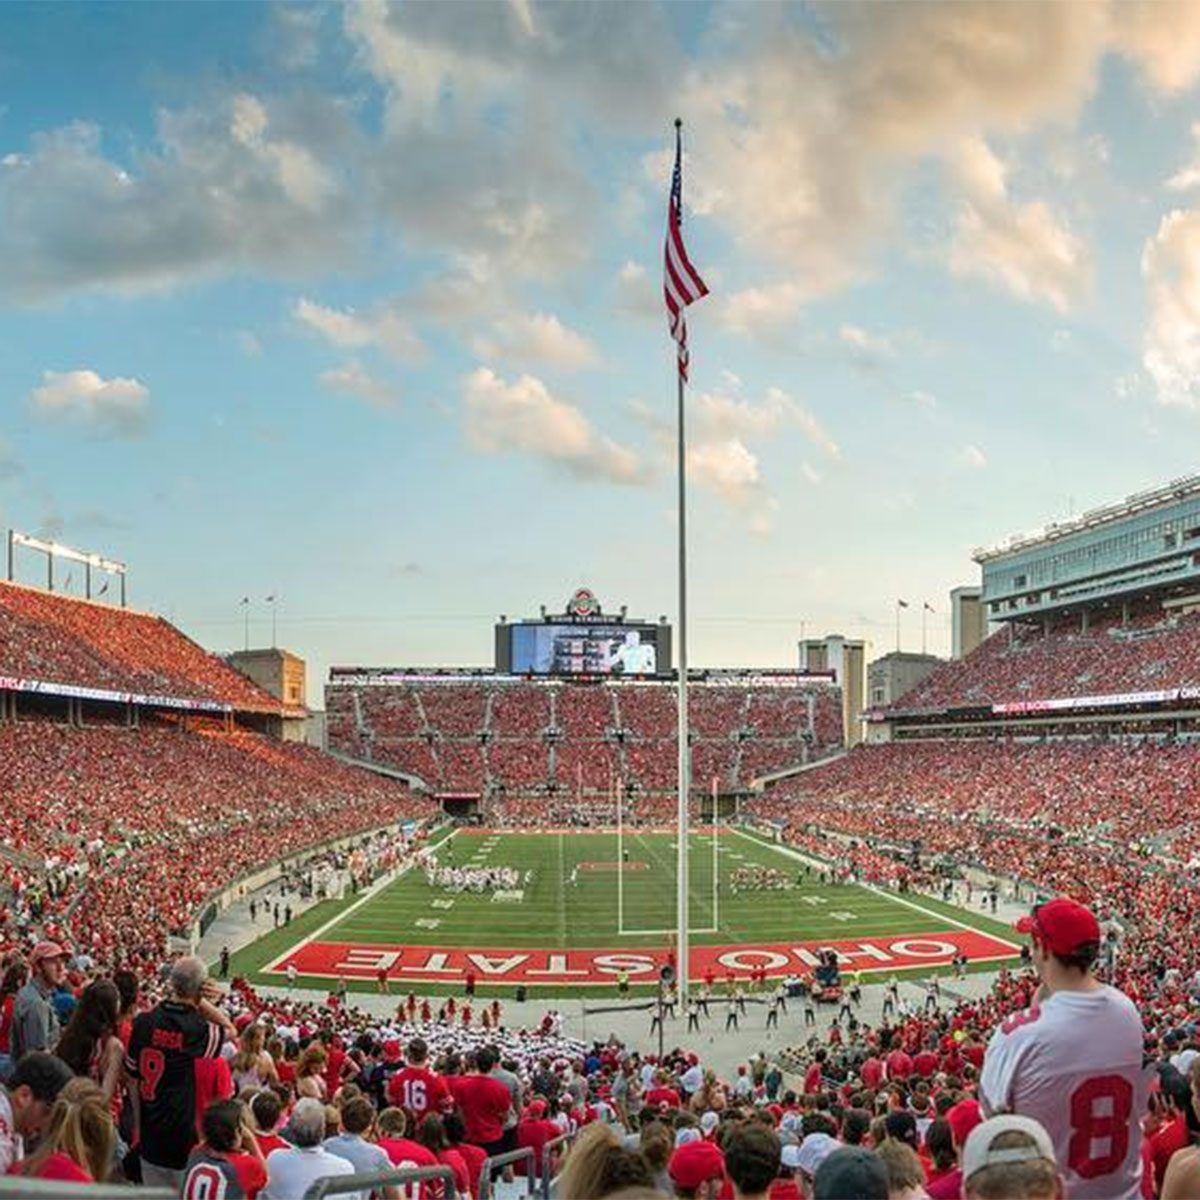 Ohio State University fans fill the stadium